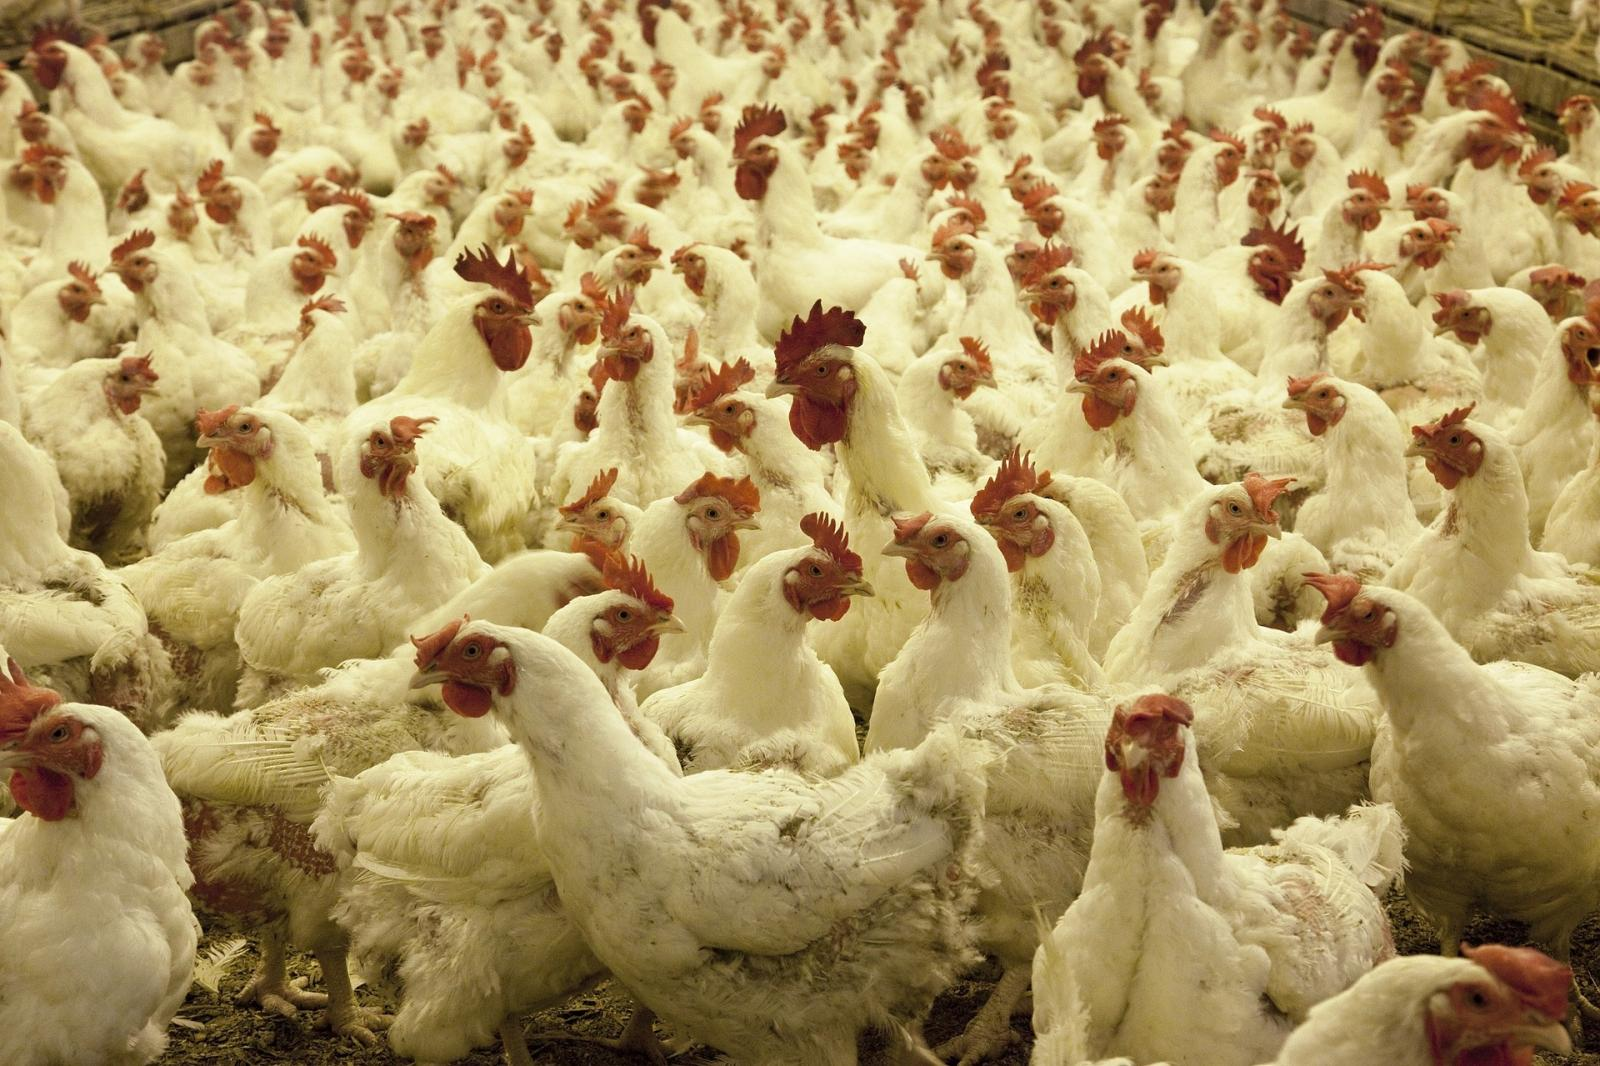 Poultry farm. Photo credit: Pixabay